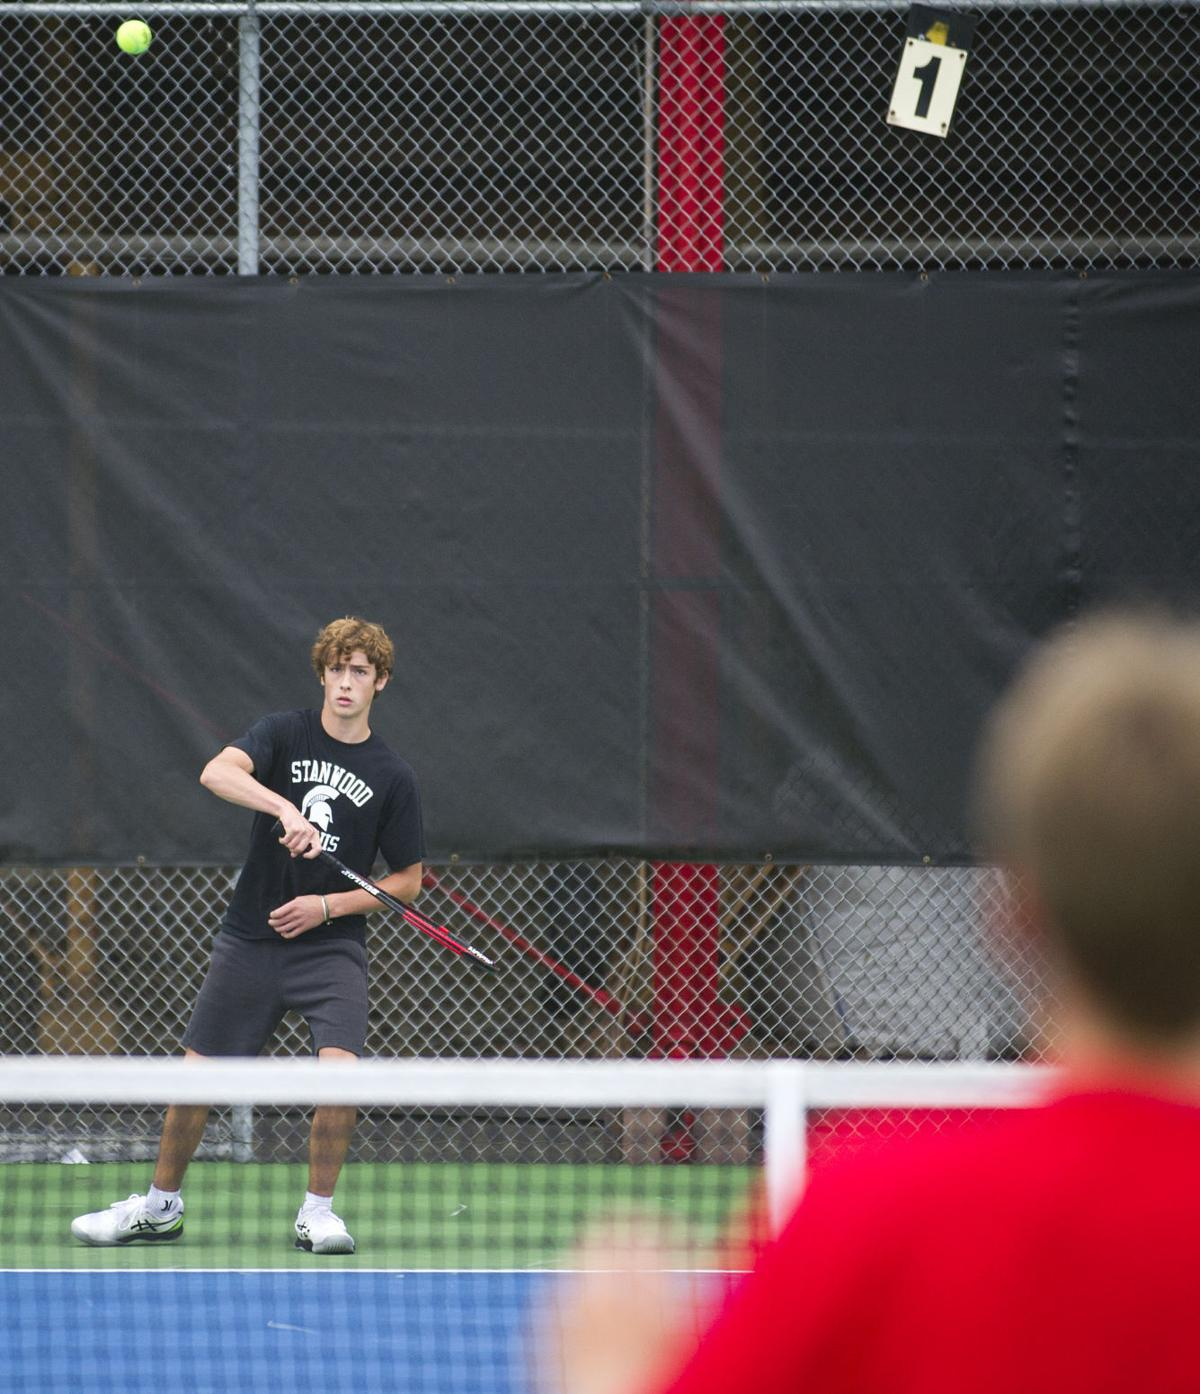 Stanwood boys tennis, 9.22.21